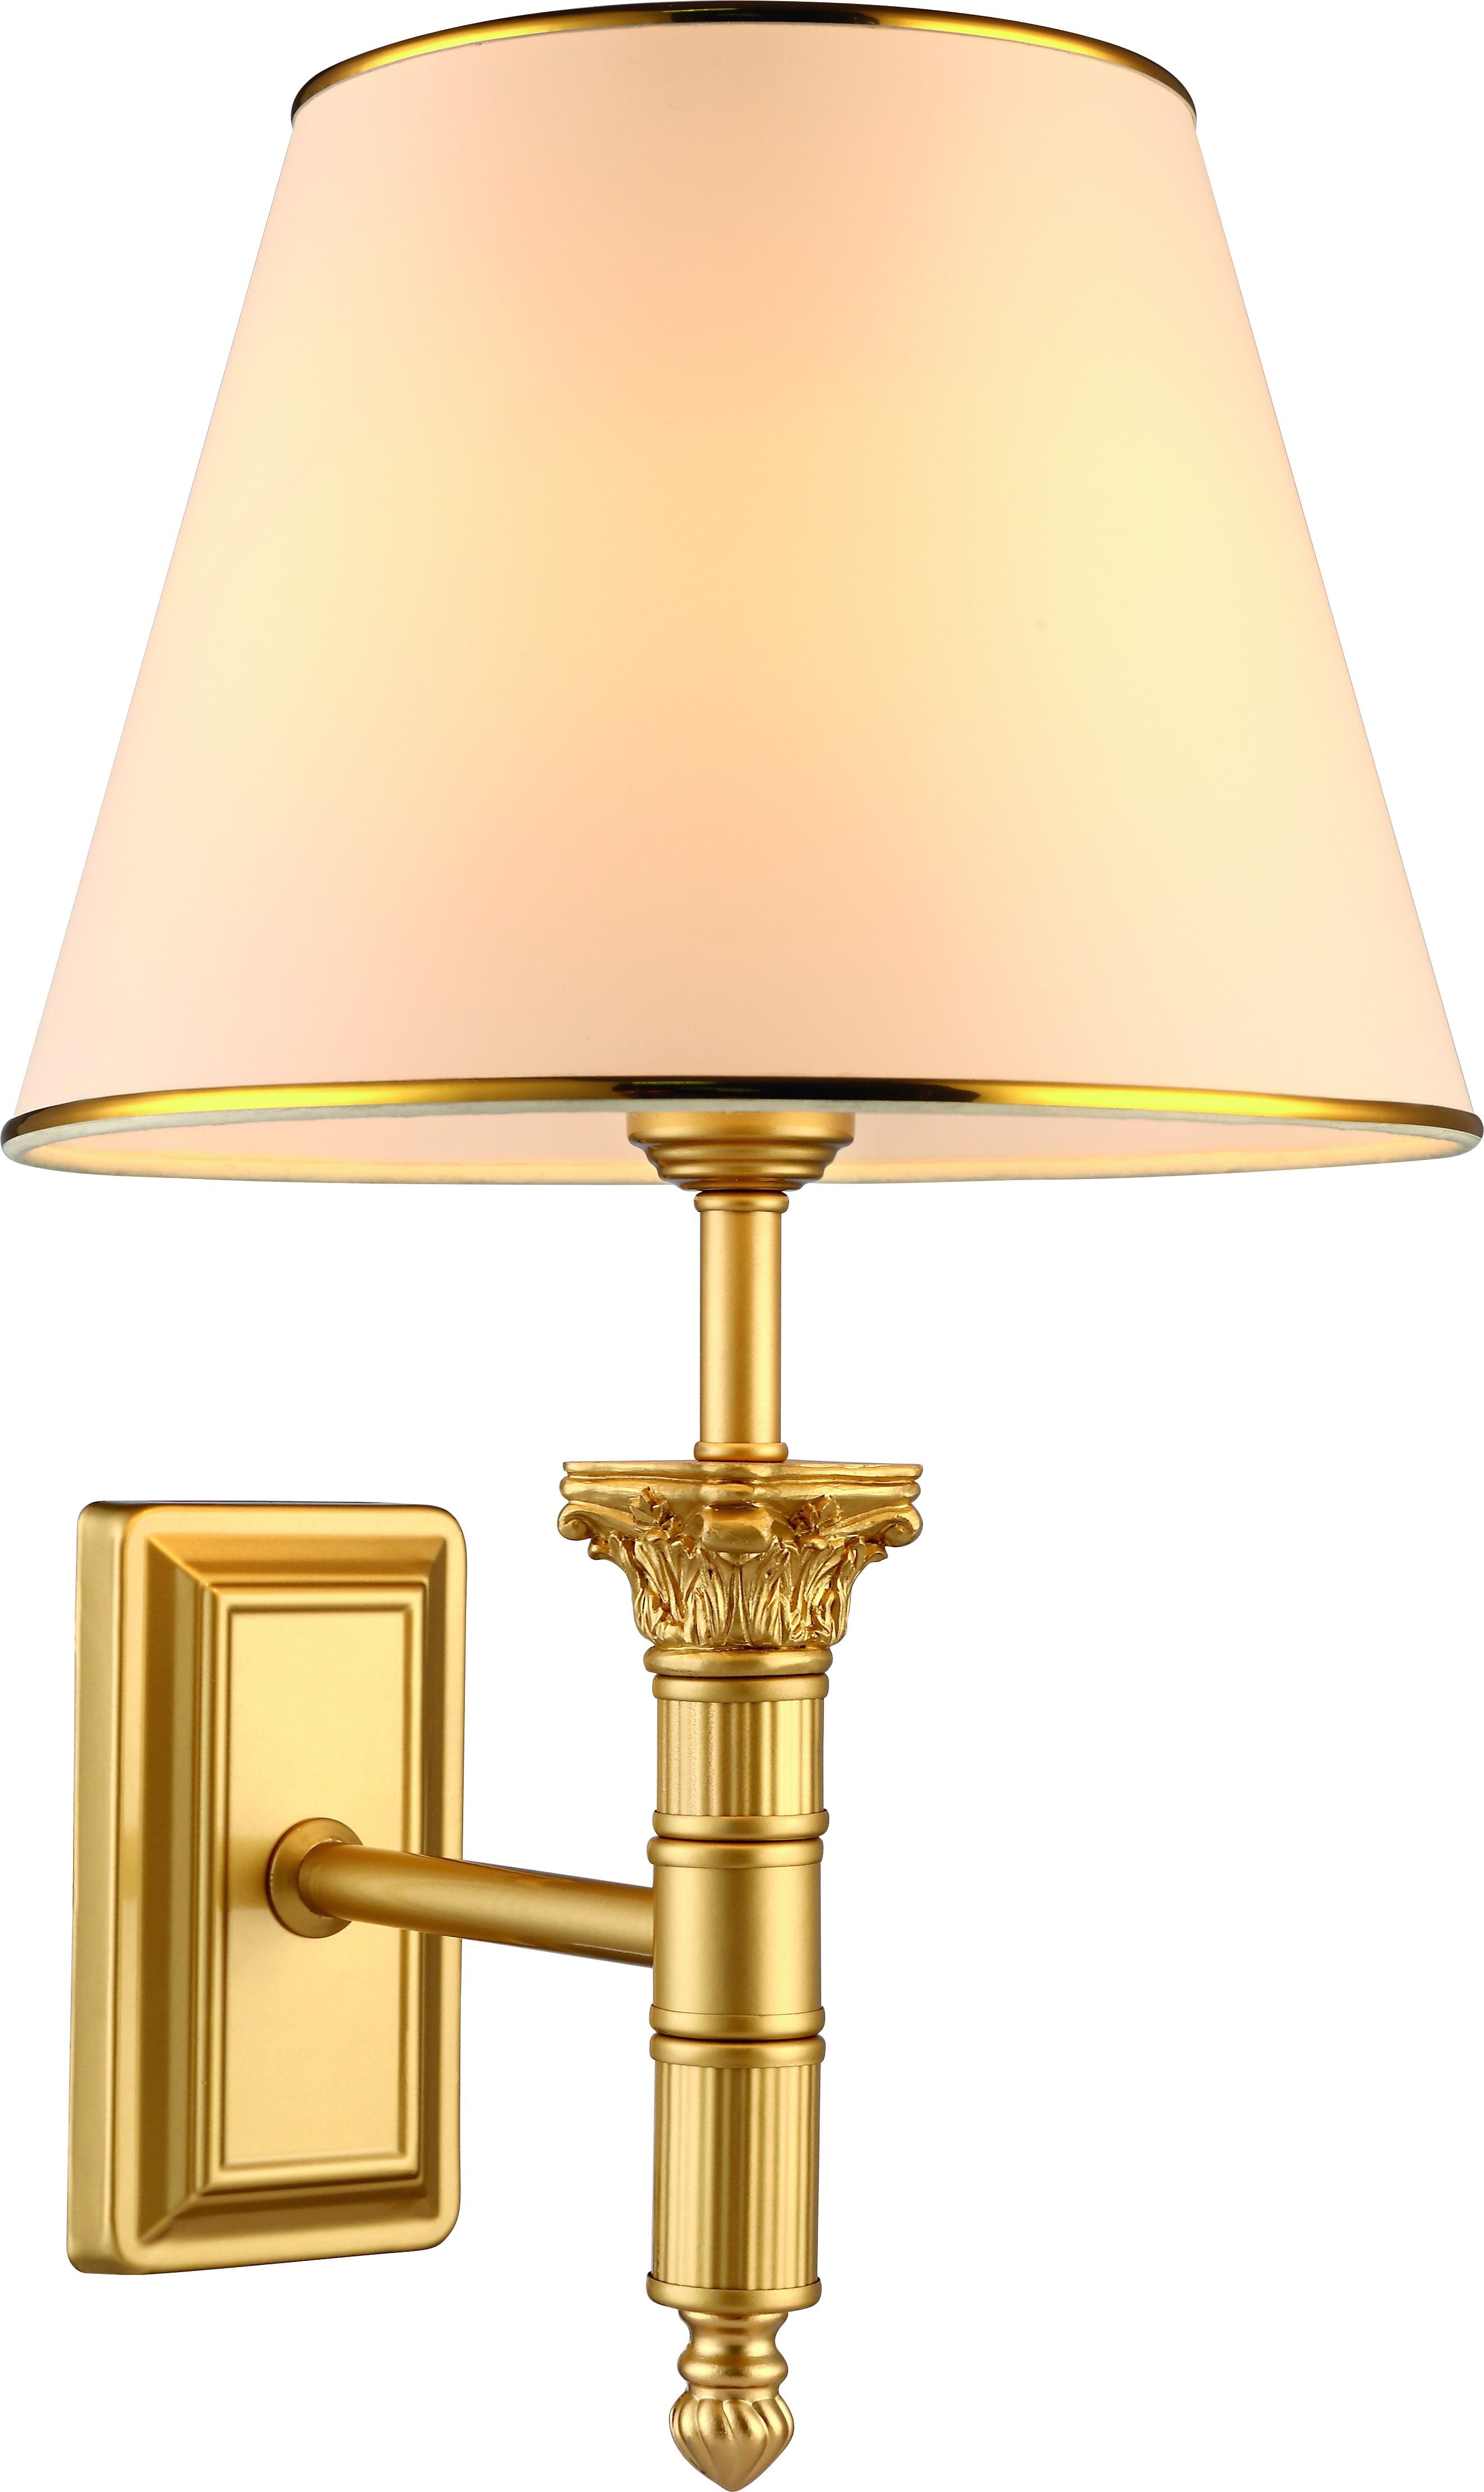 Бра Arte lamp A9185ap-1sg бра arte lamp budapest a9185ap 1sg